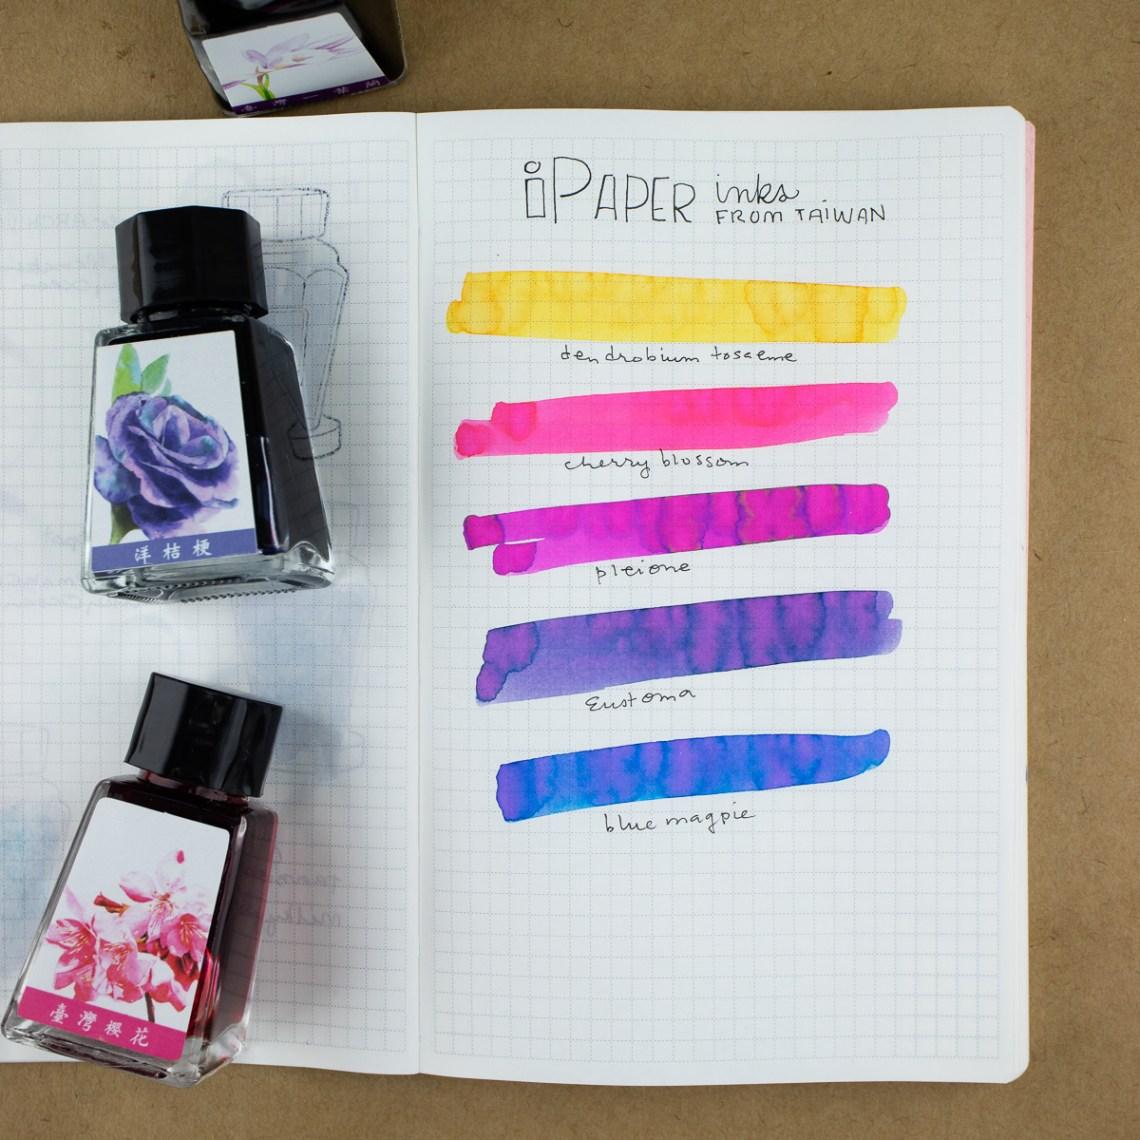 ipaper inks